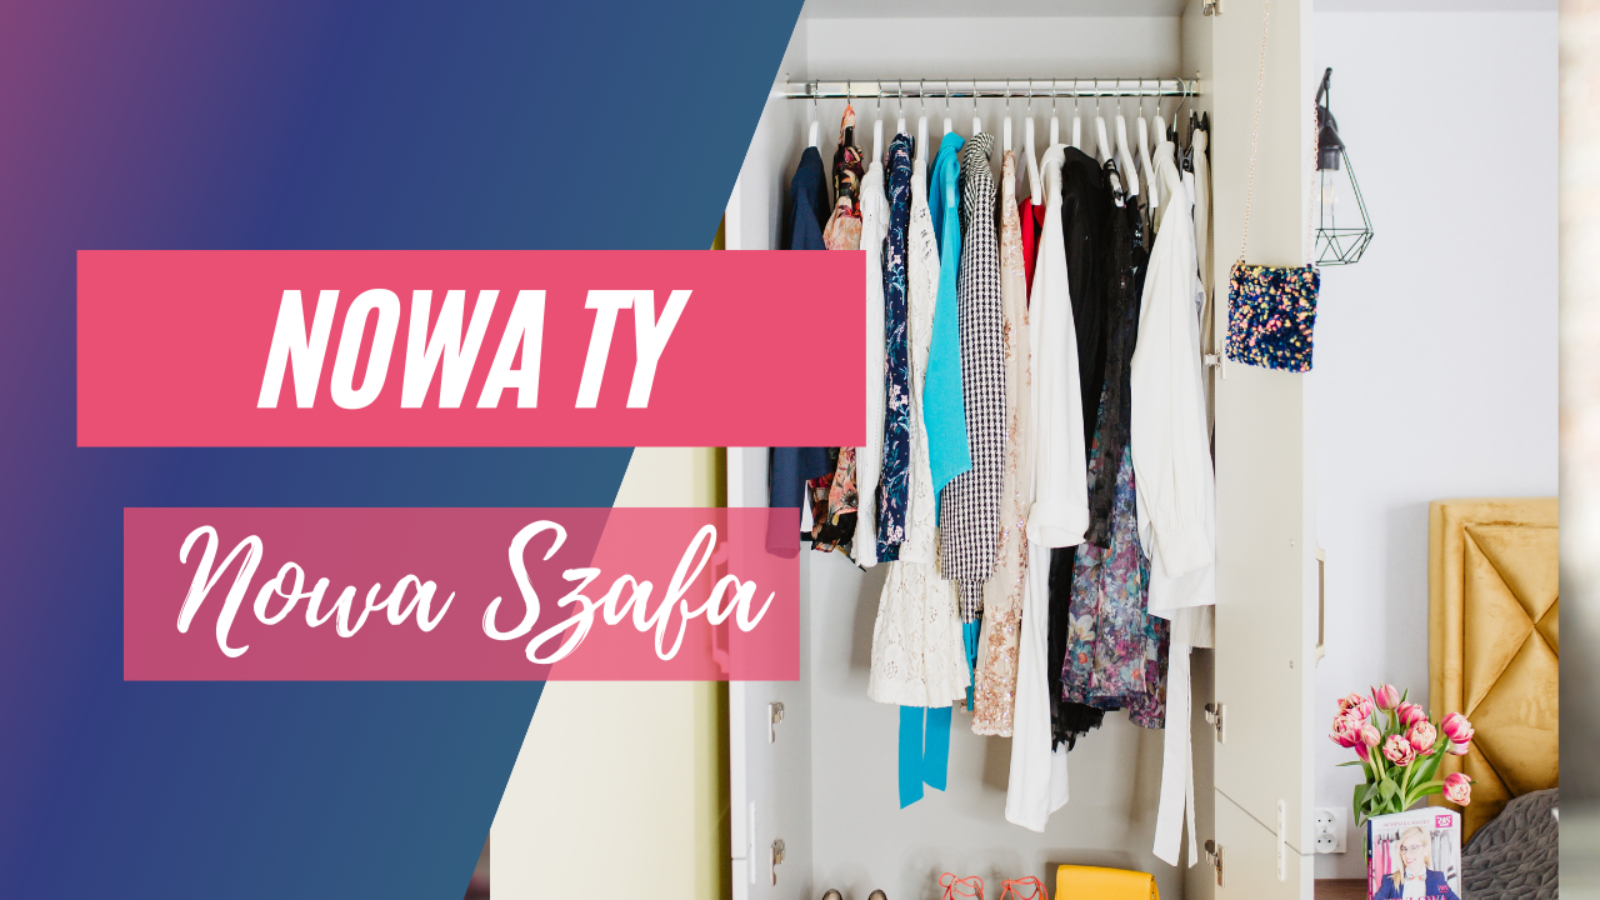 Nowa Szafa. Nowa Ty. Agnieszka Nortey